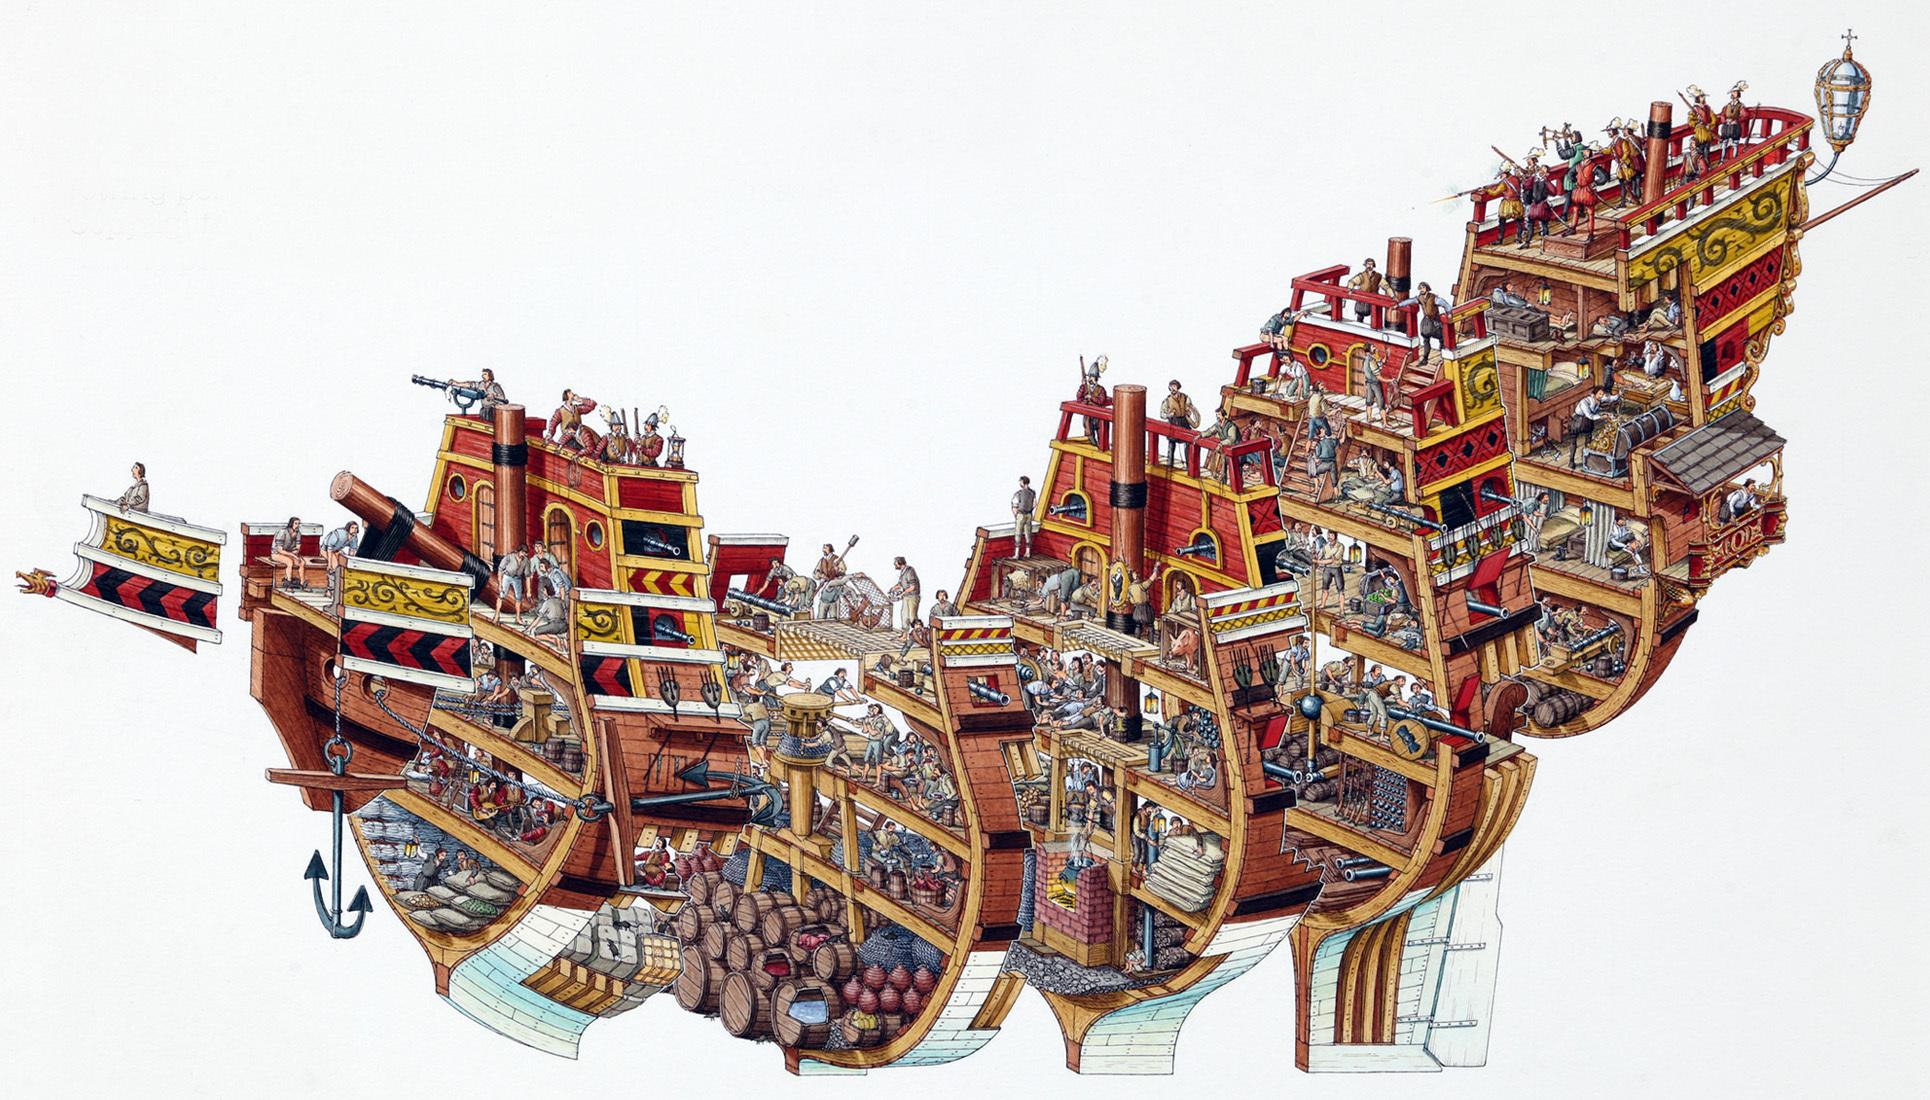 Stephen Biesty Big Galleon